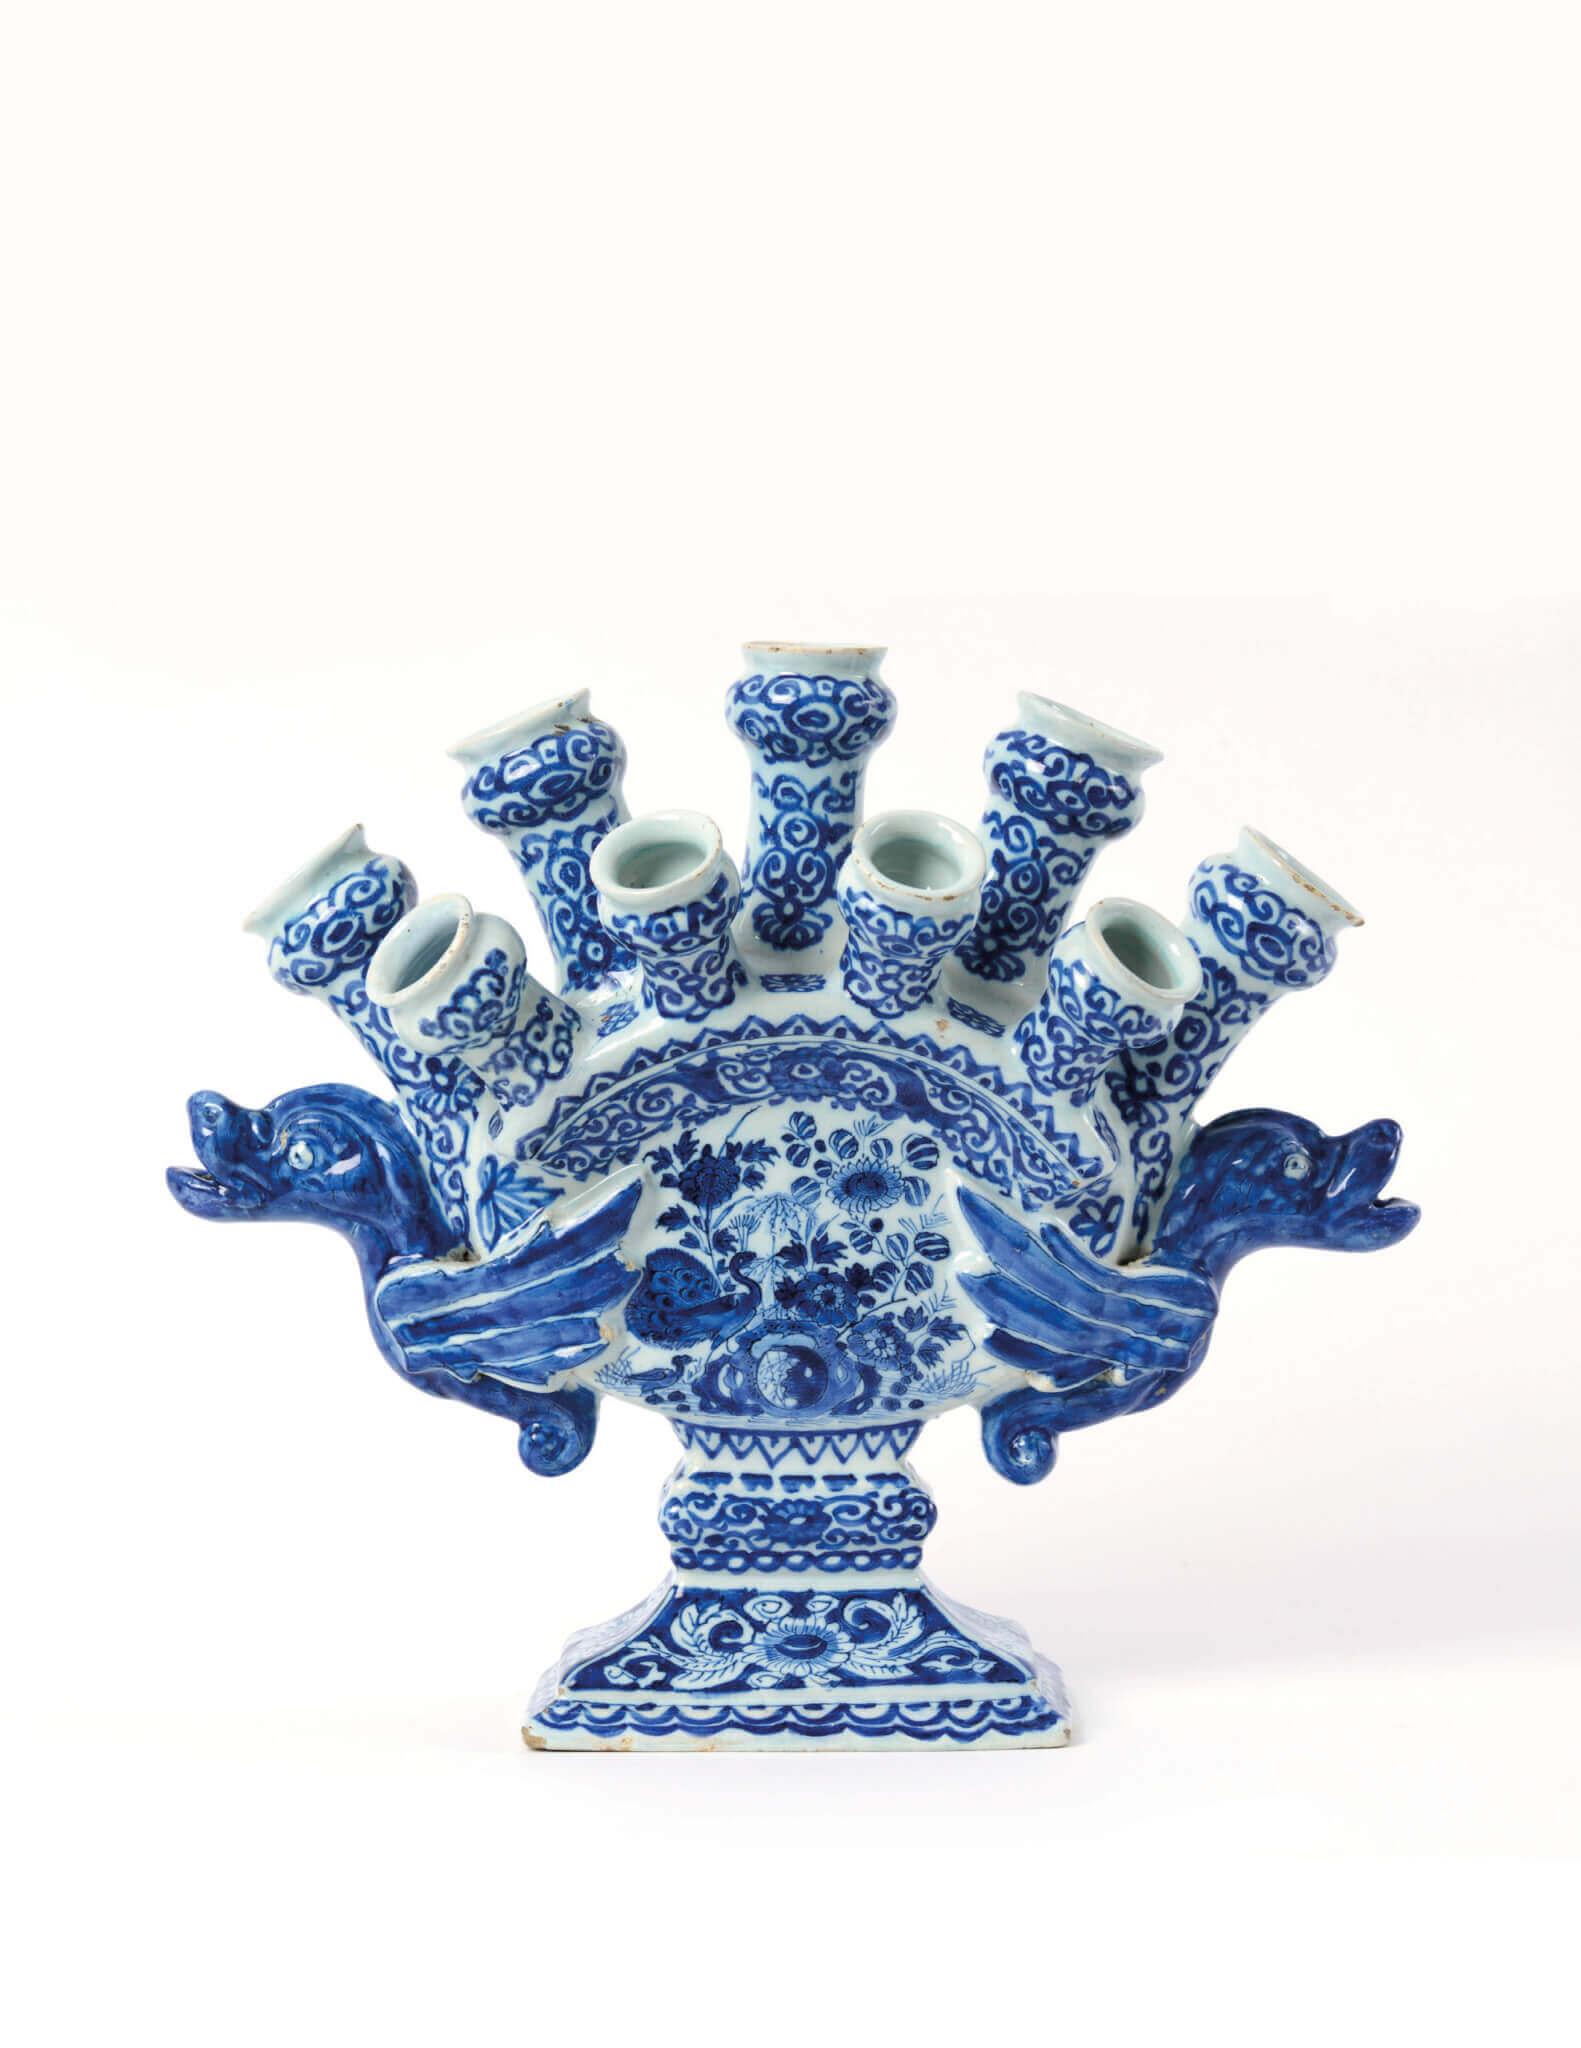 Blue and white Delftware flower vase